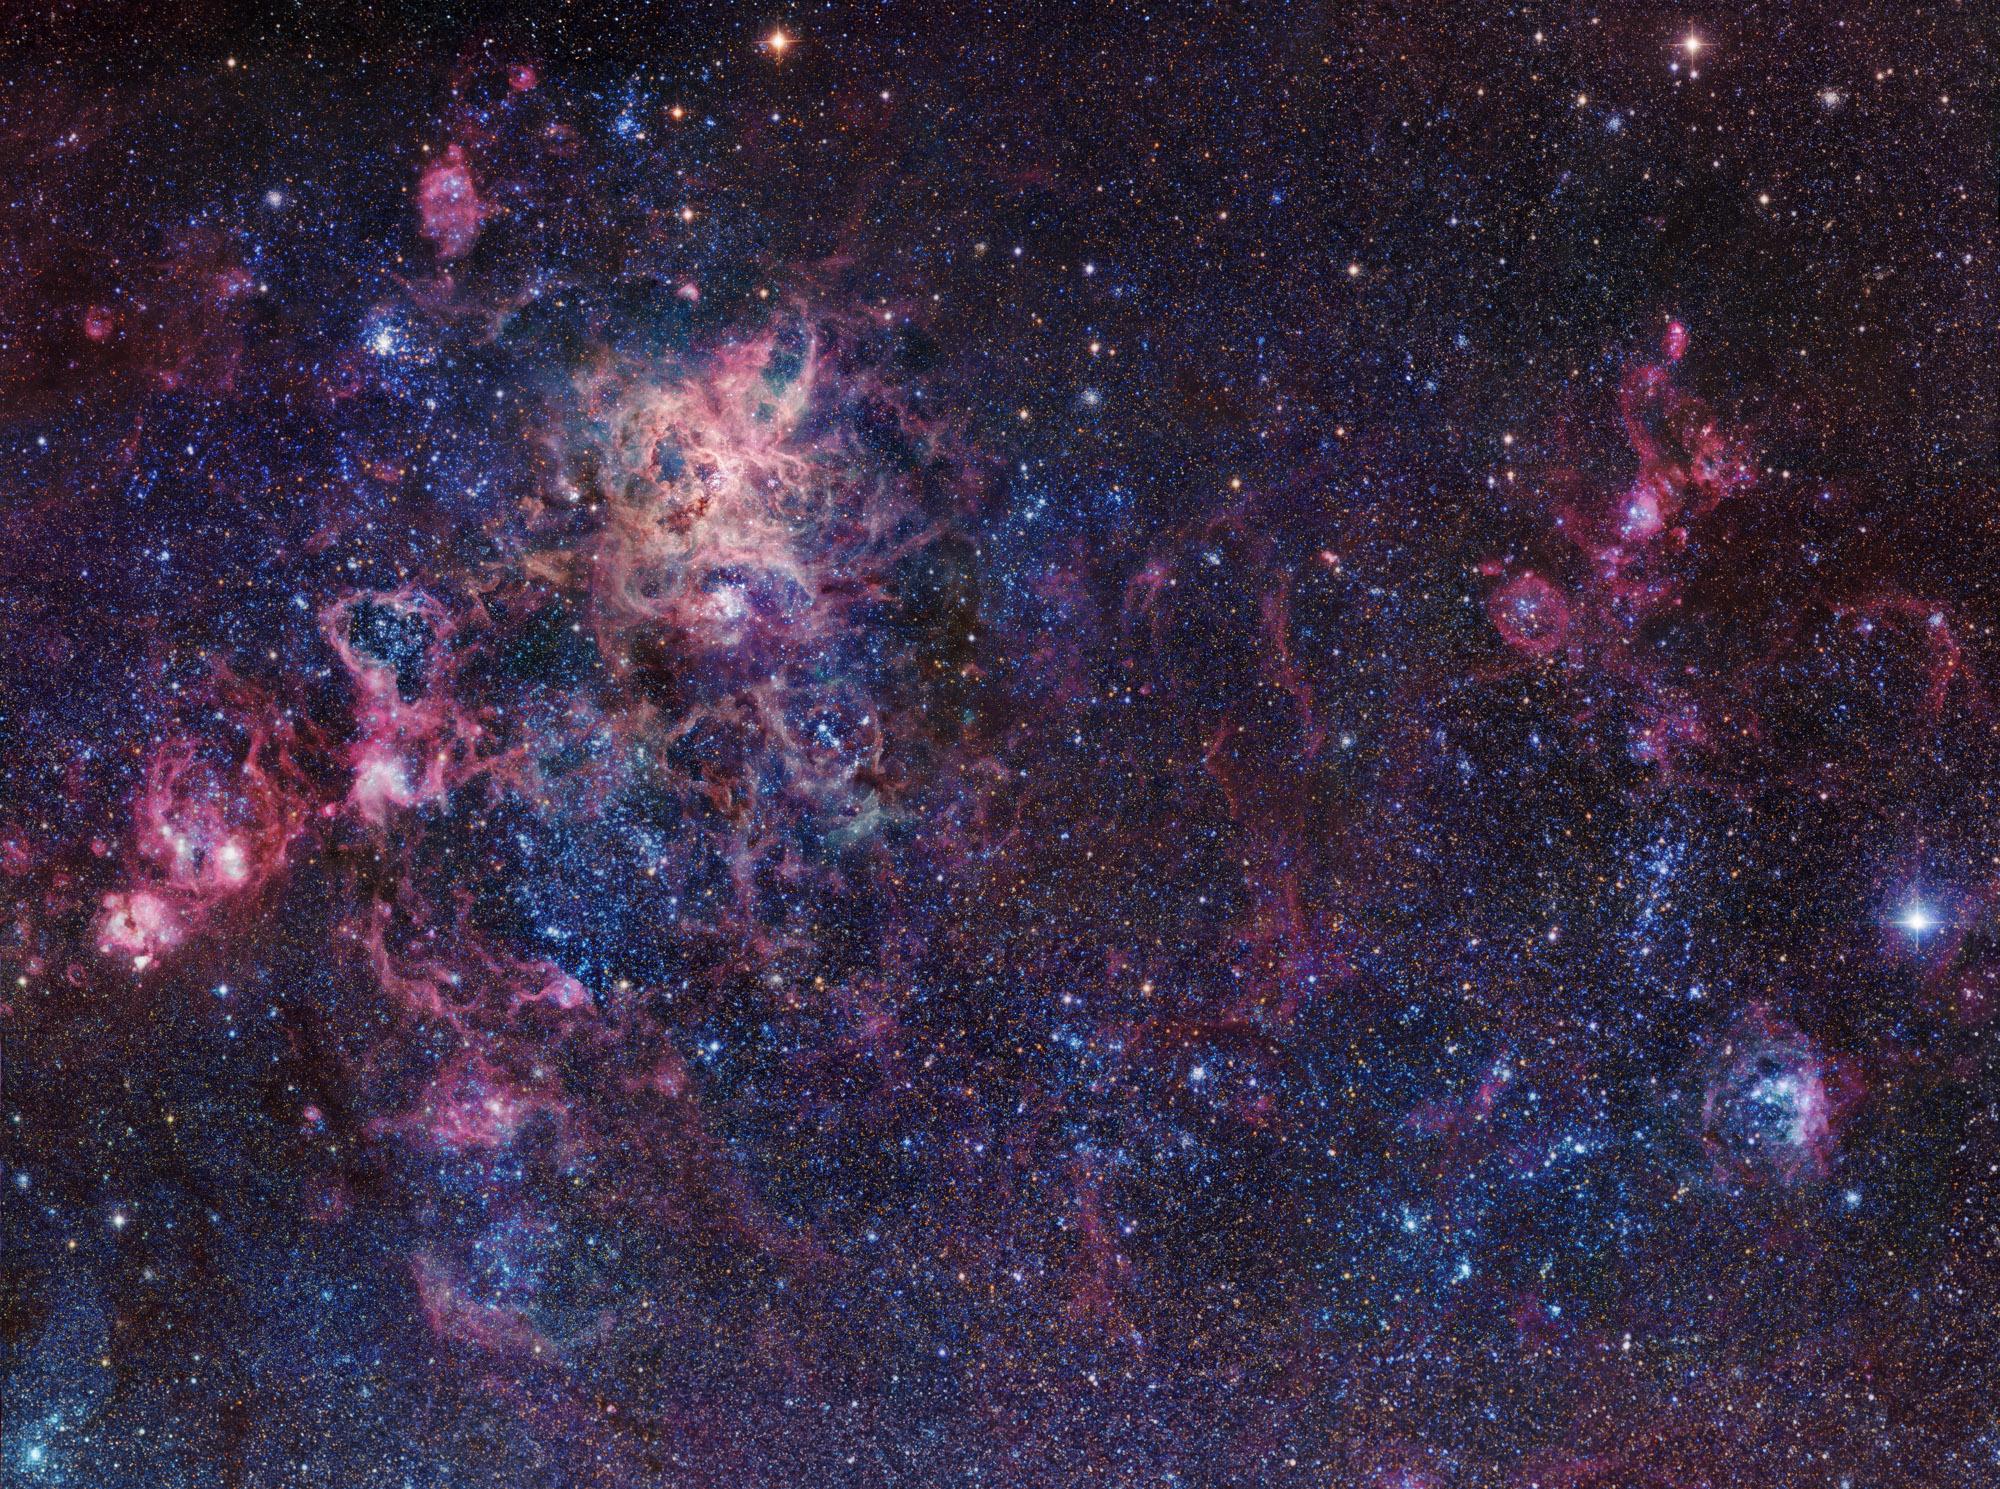 NGC 2070 Tarantula Nebula by Rob Gendle.